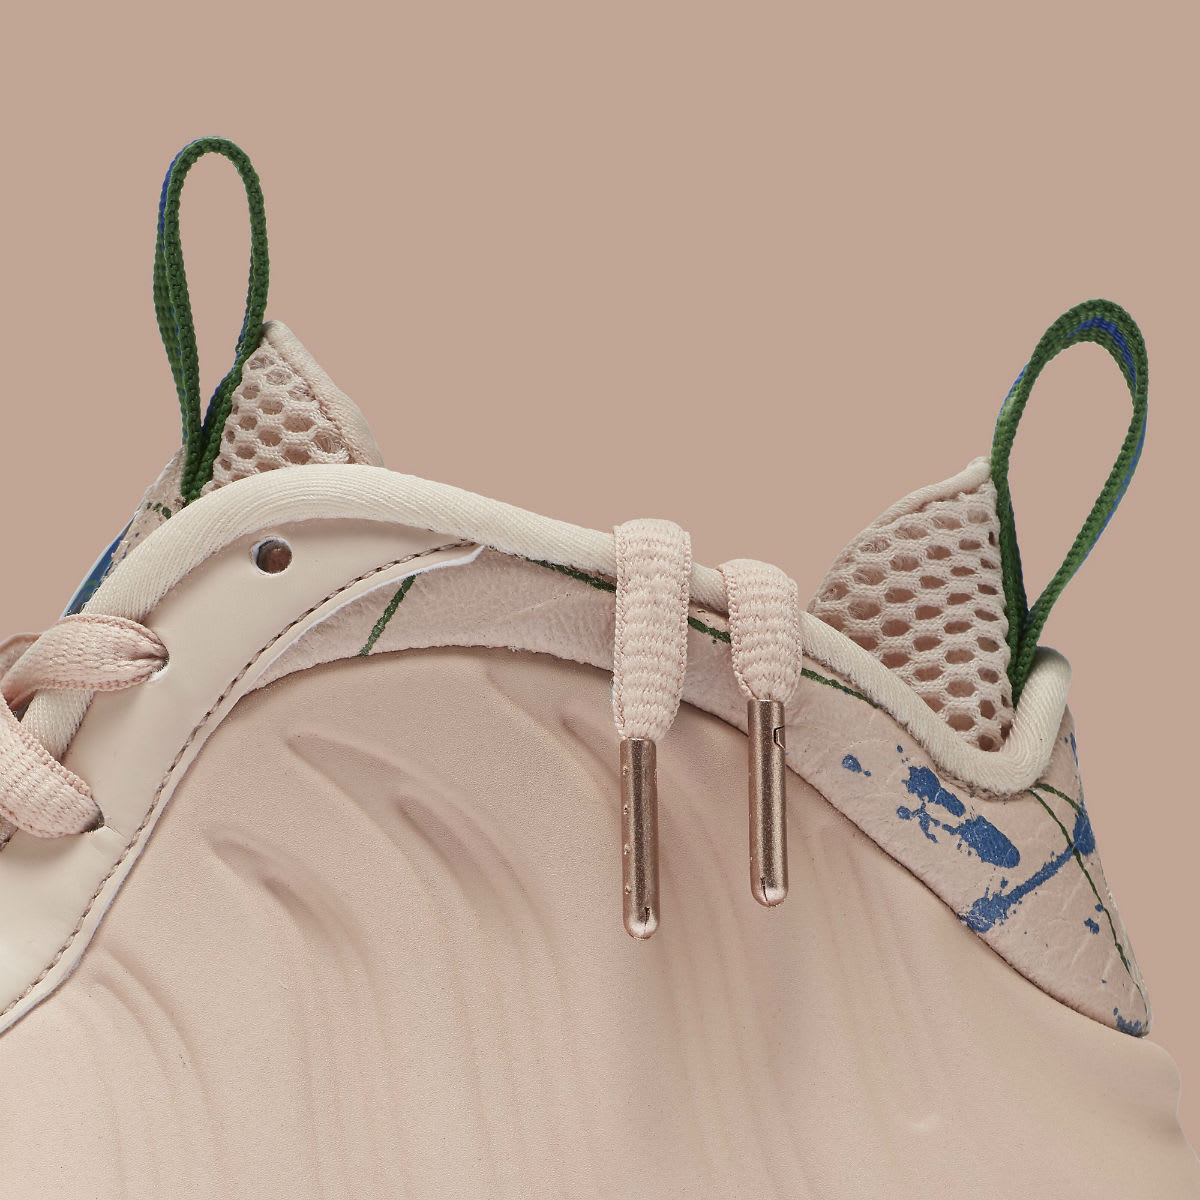 Nike Women's Air Foamposite One Particle Beige Release Date AA3963-200 Collar